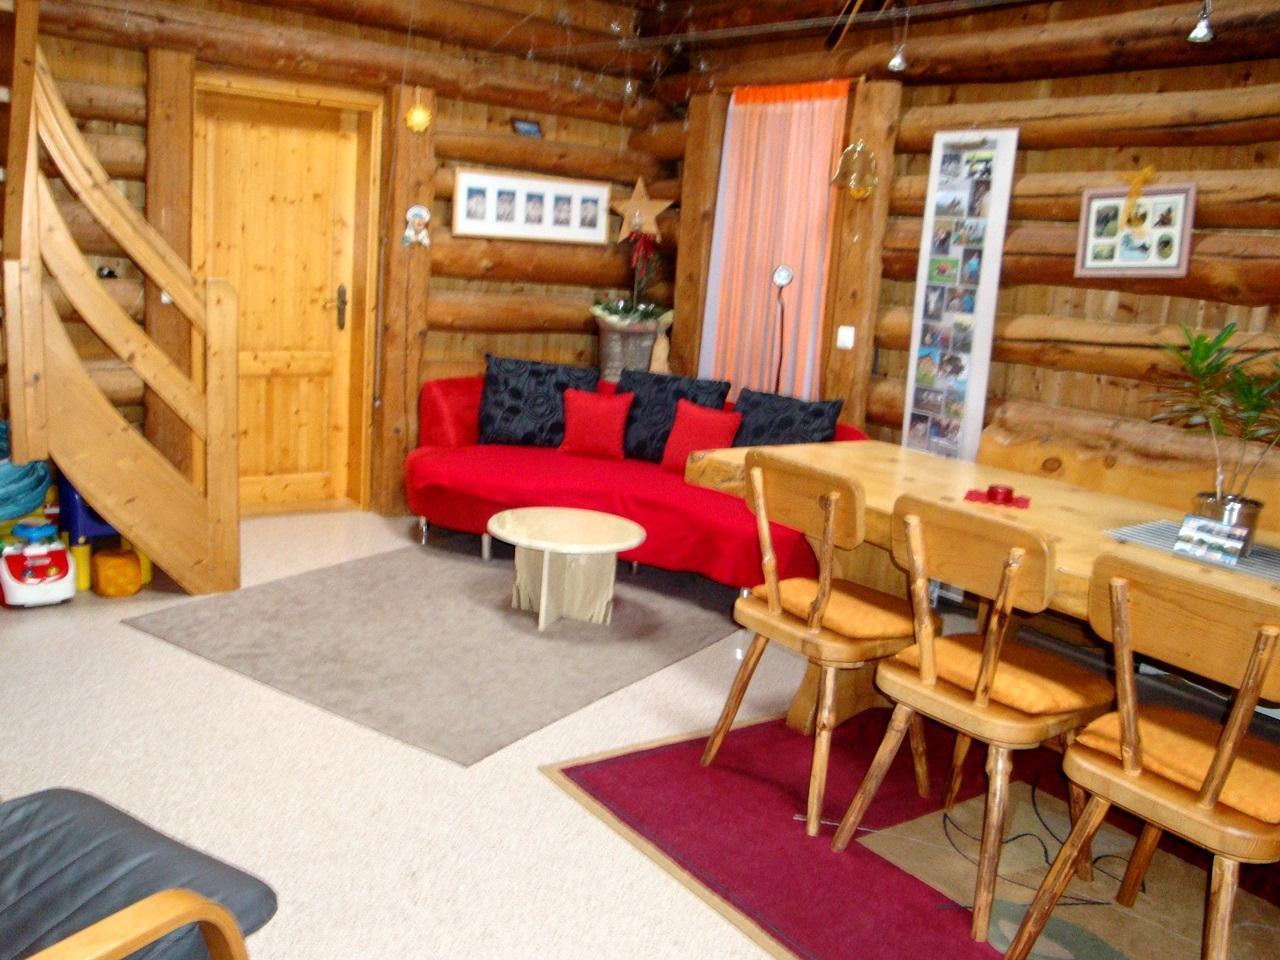 Appartement de vacances Bellahof (862366), Flumserberg Bergheim, Pays d'Heidi, Suisse Orientale, Suisse, image 2